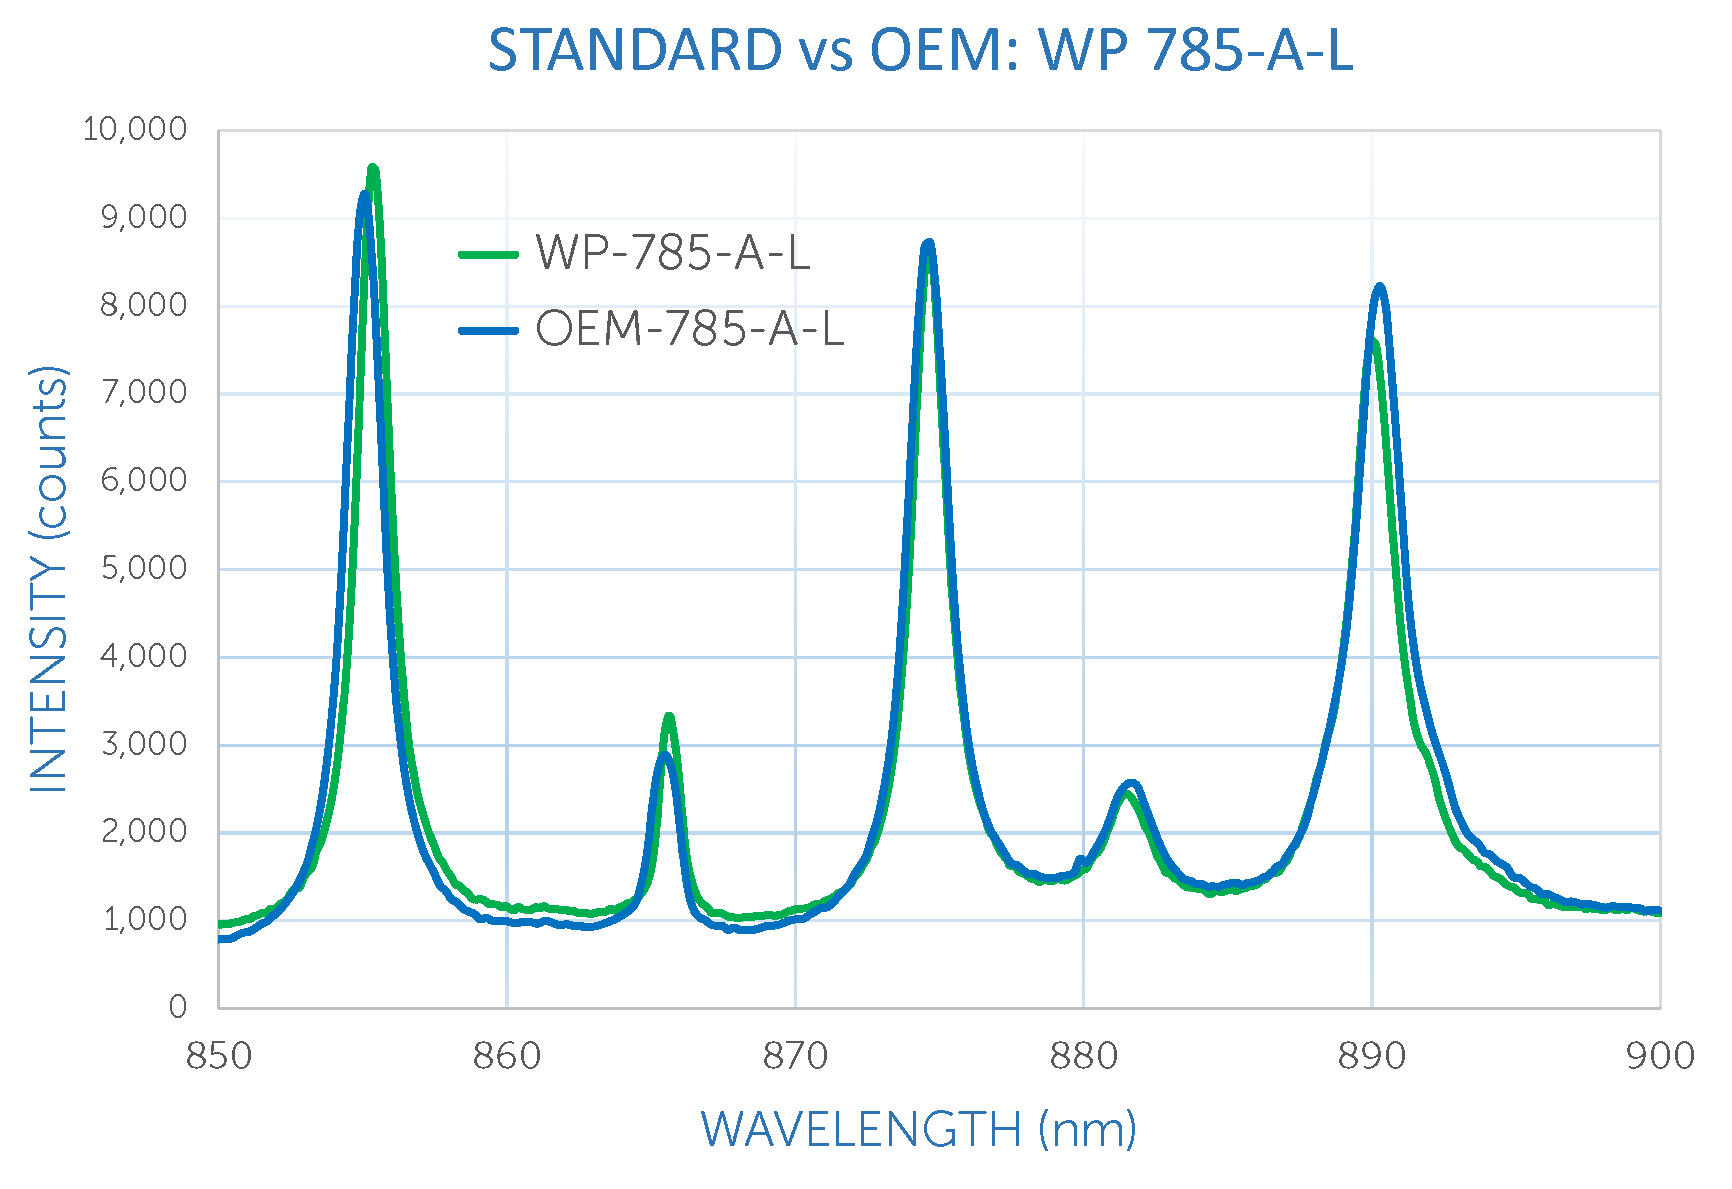 Standard WP 785-A-L vs the OEM module equivalent